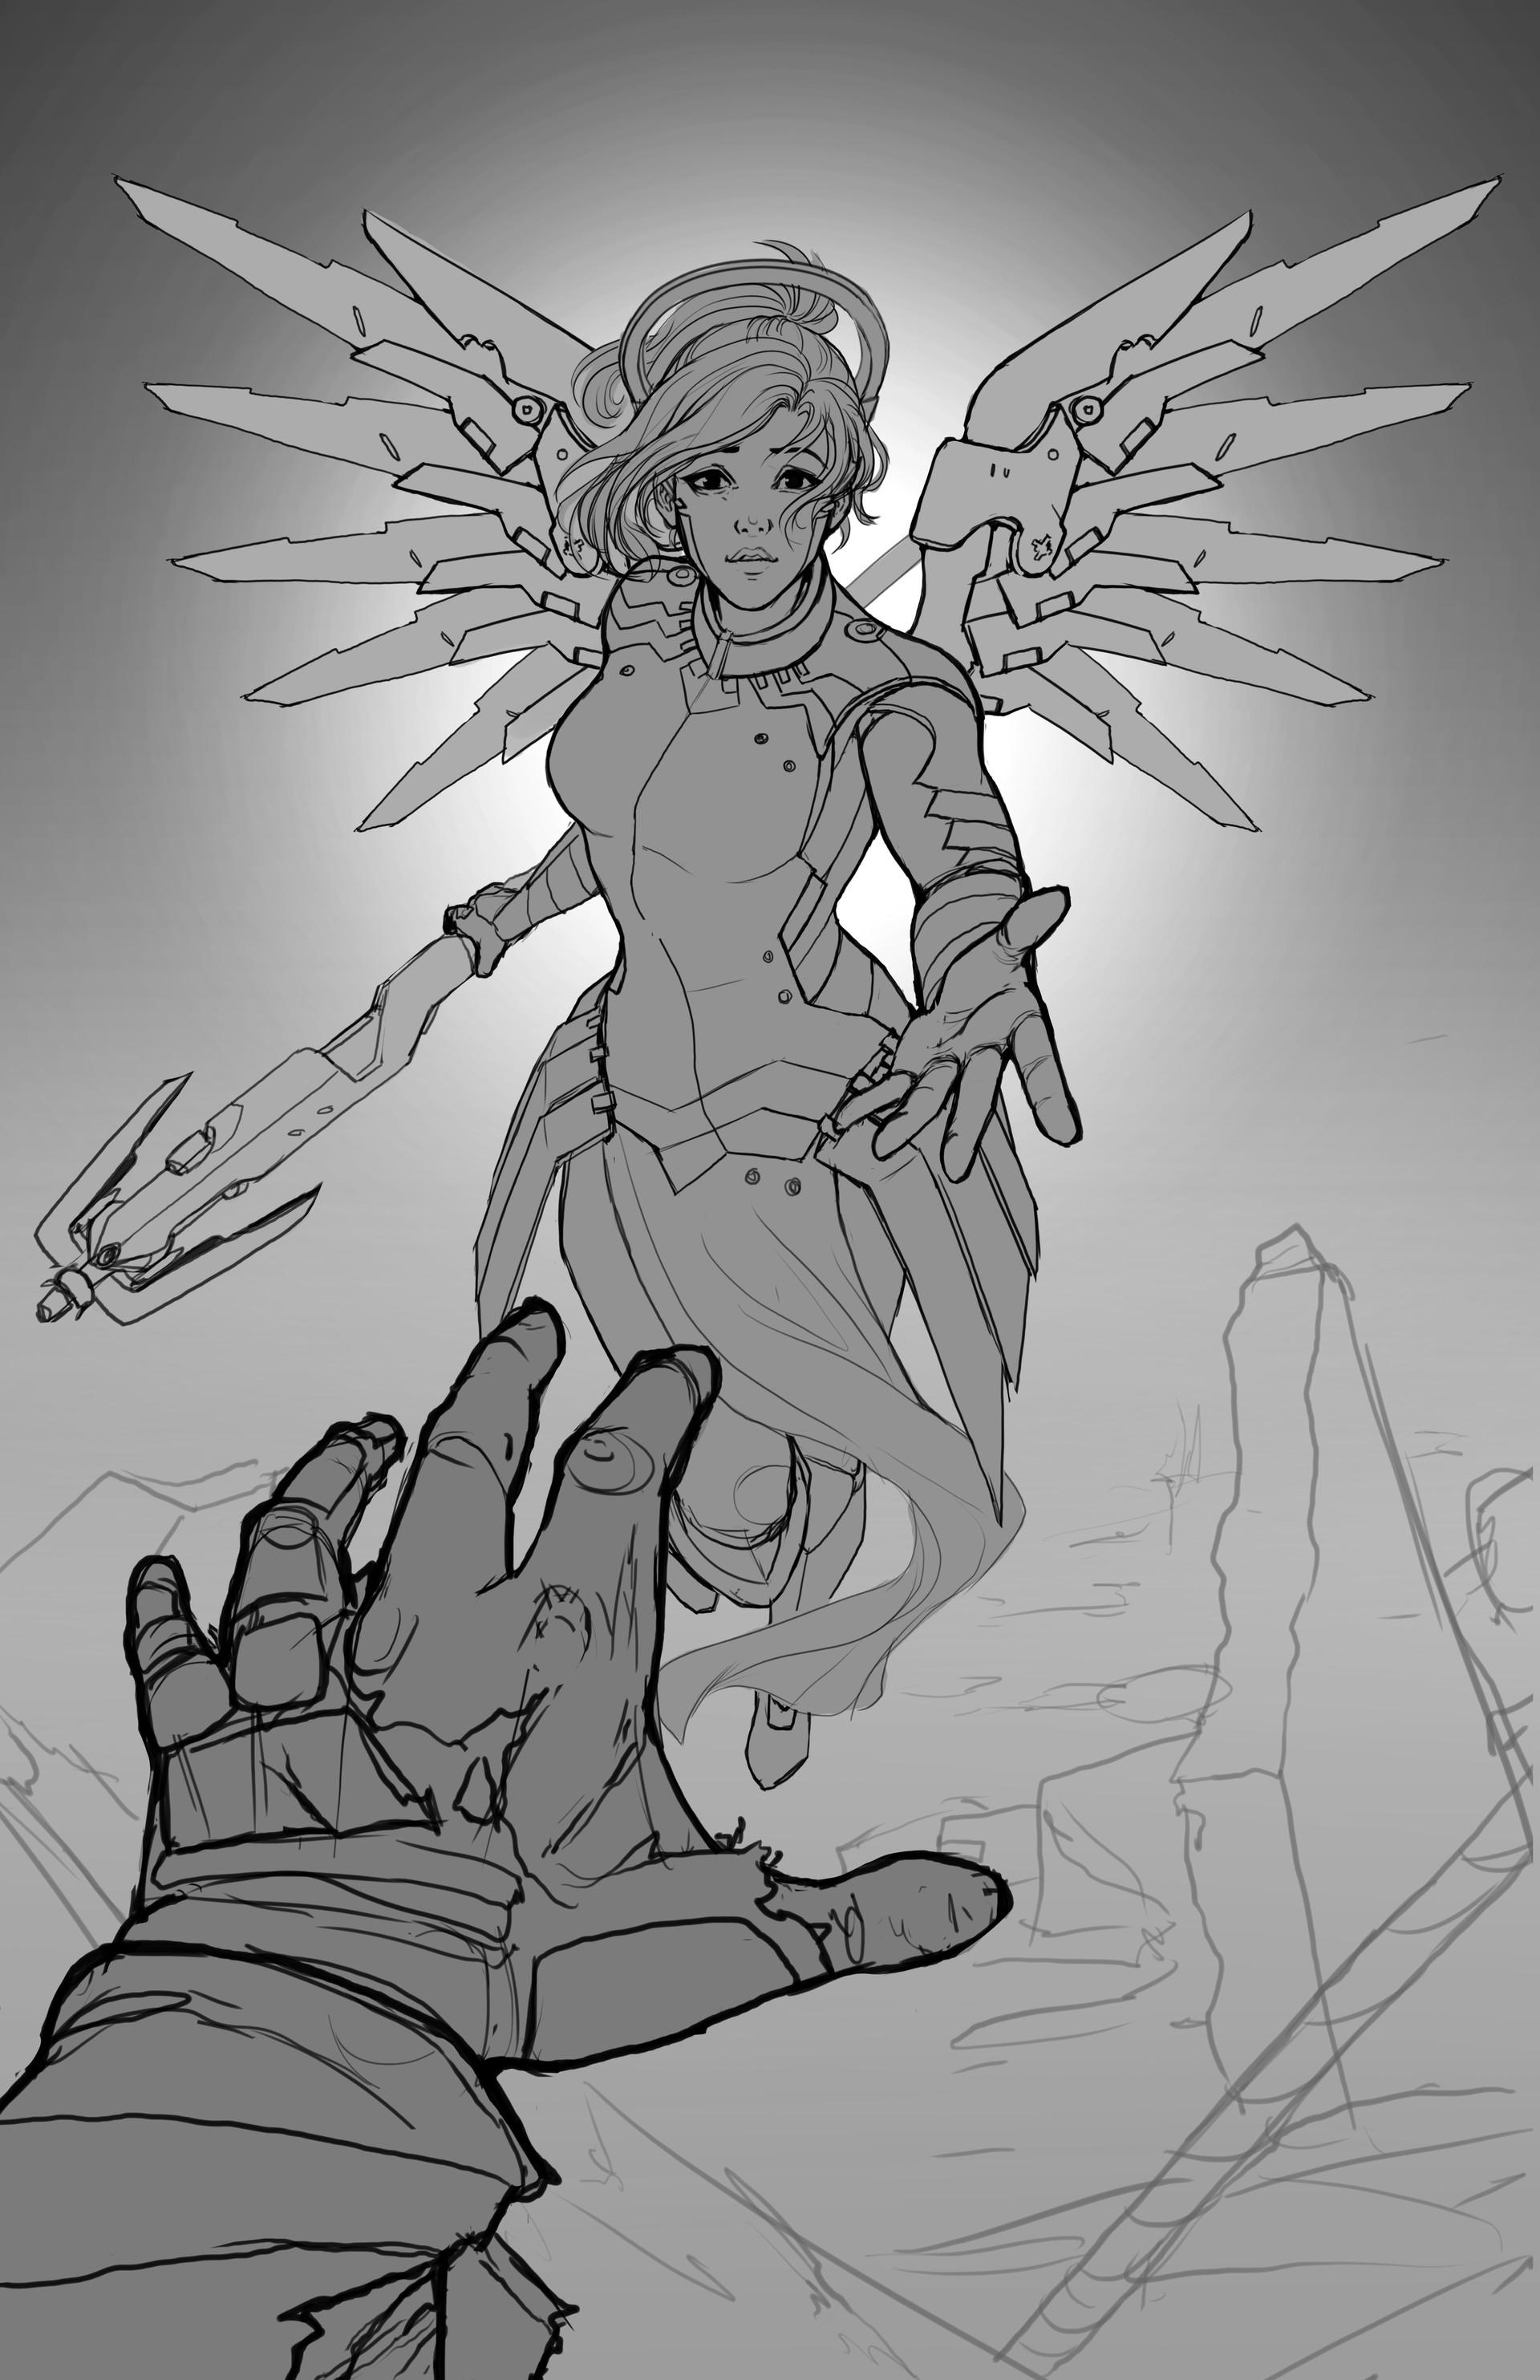 Whitney lanier mercy angel lines